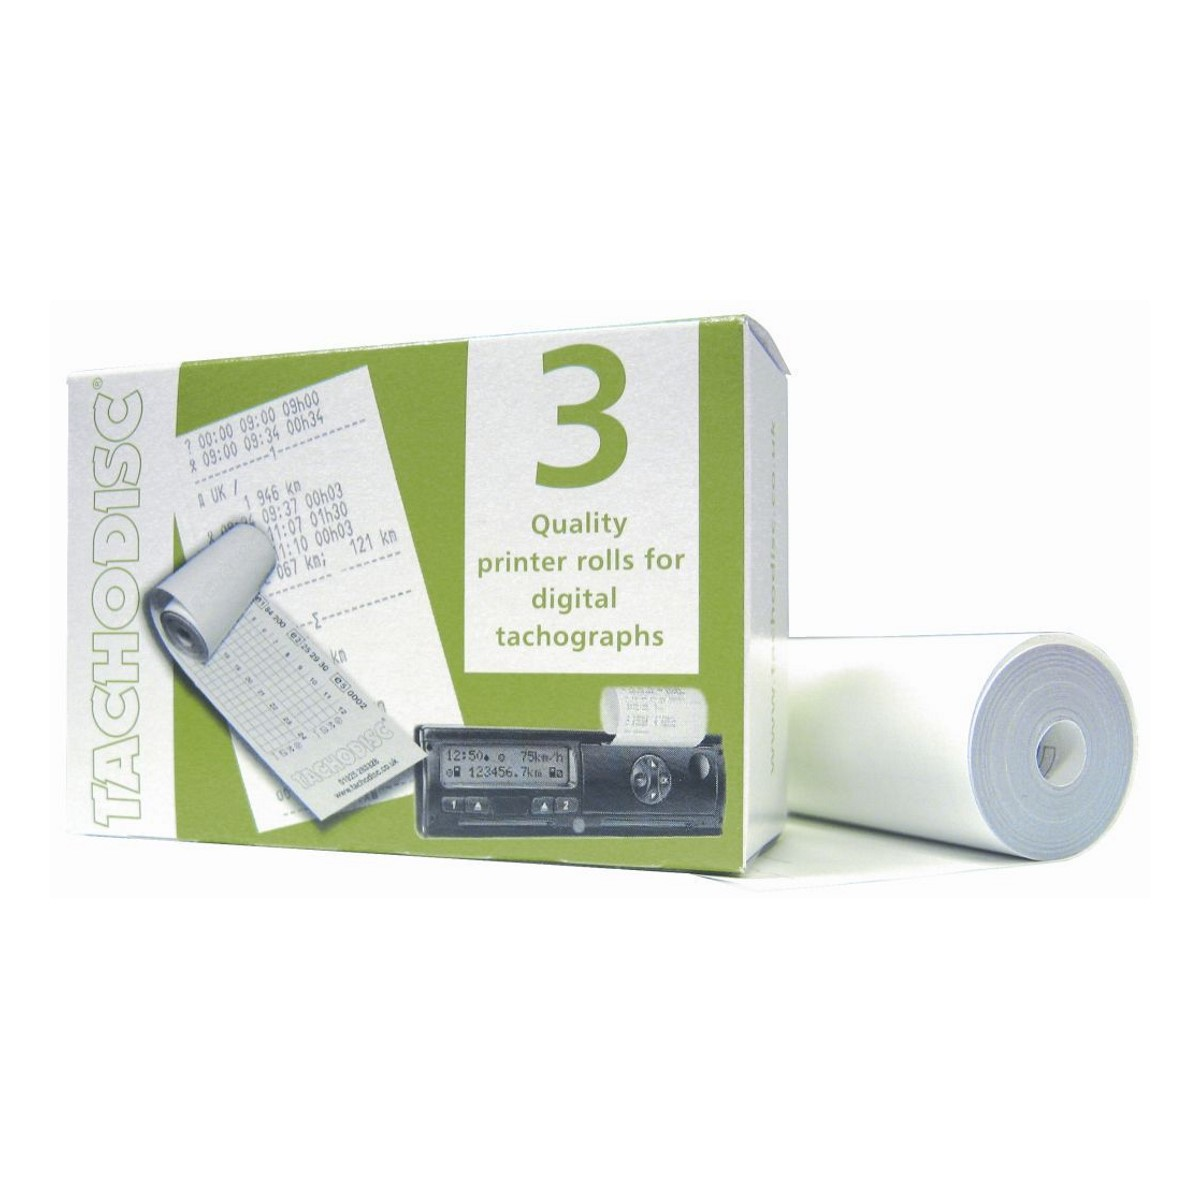 Digital Tacho Rolls Pack of 3